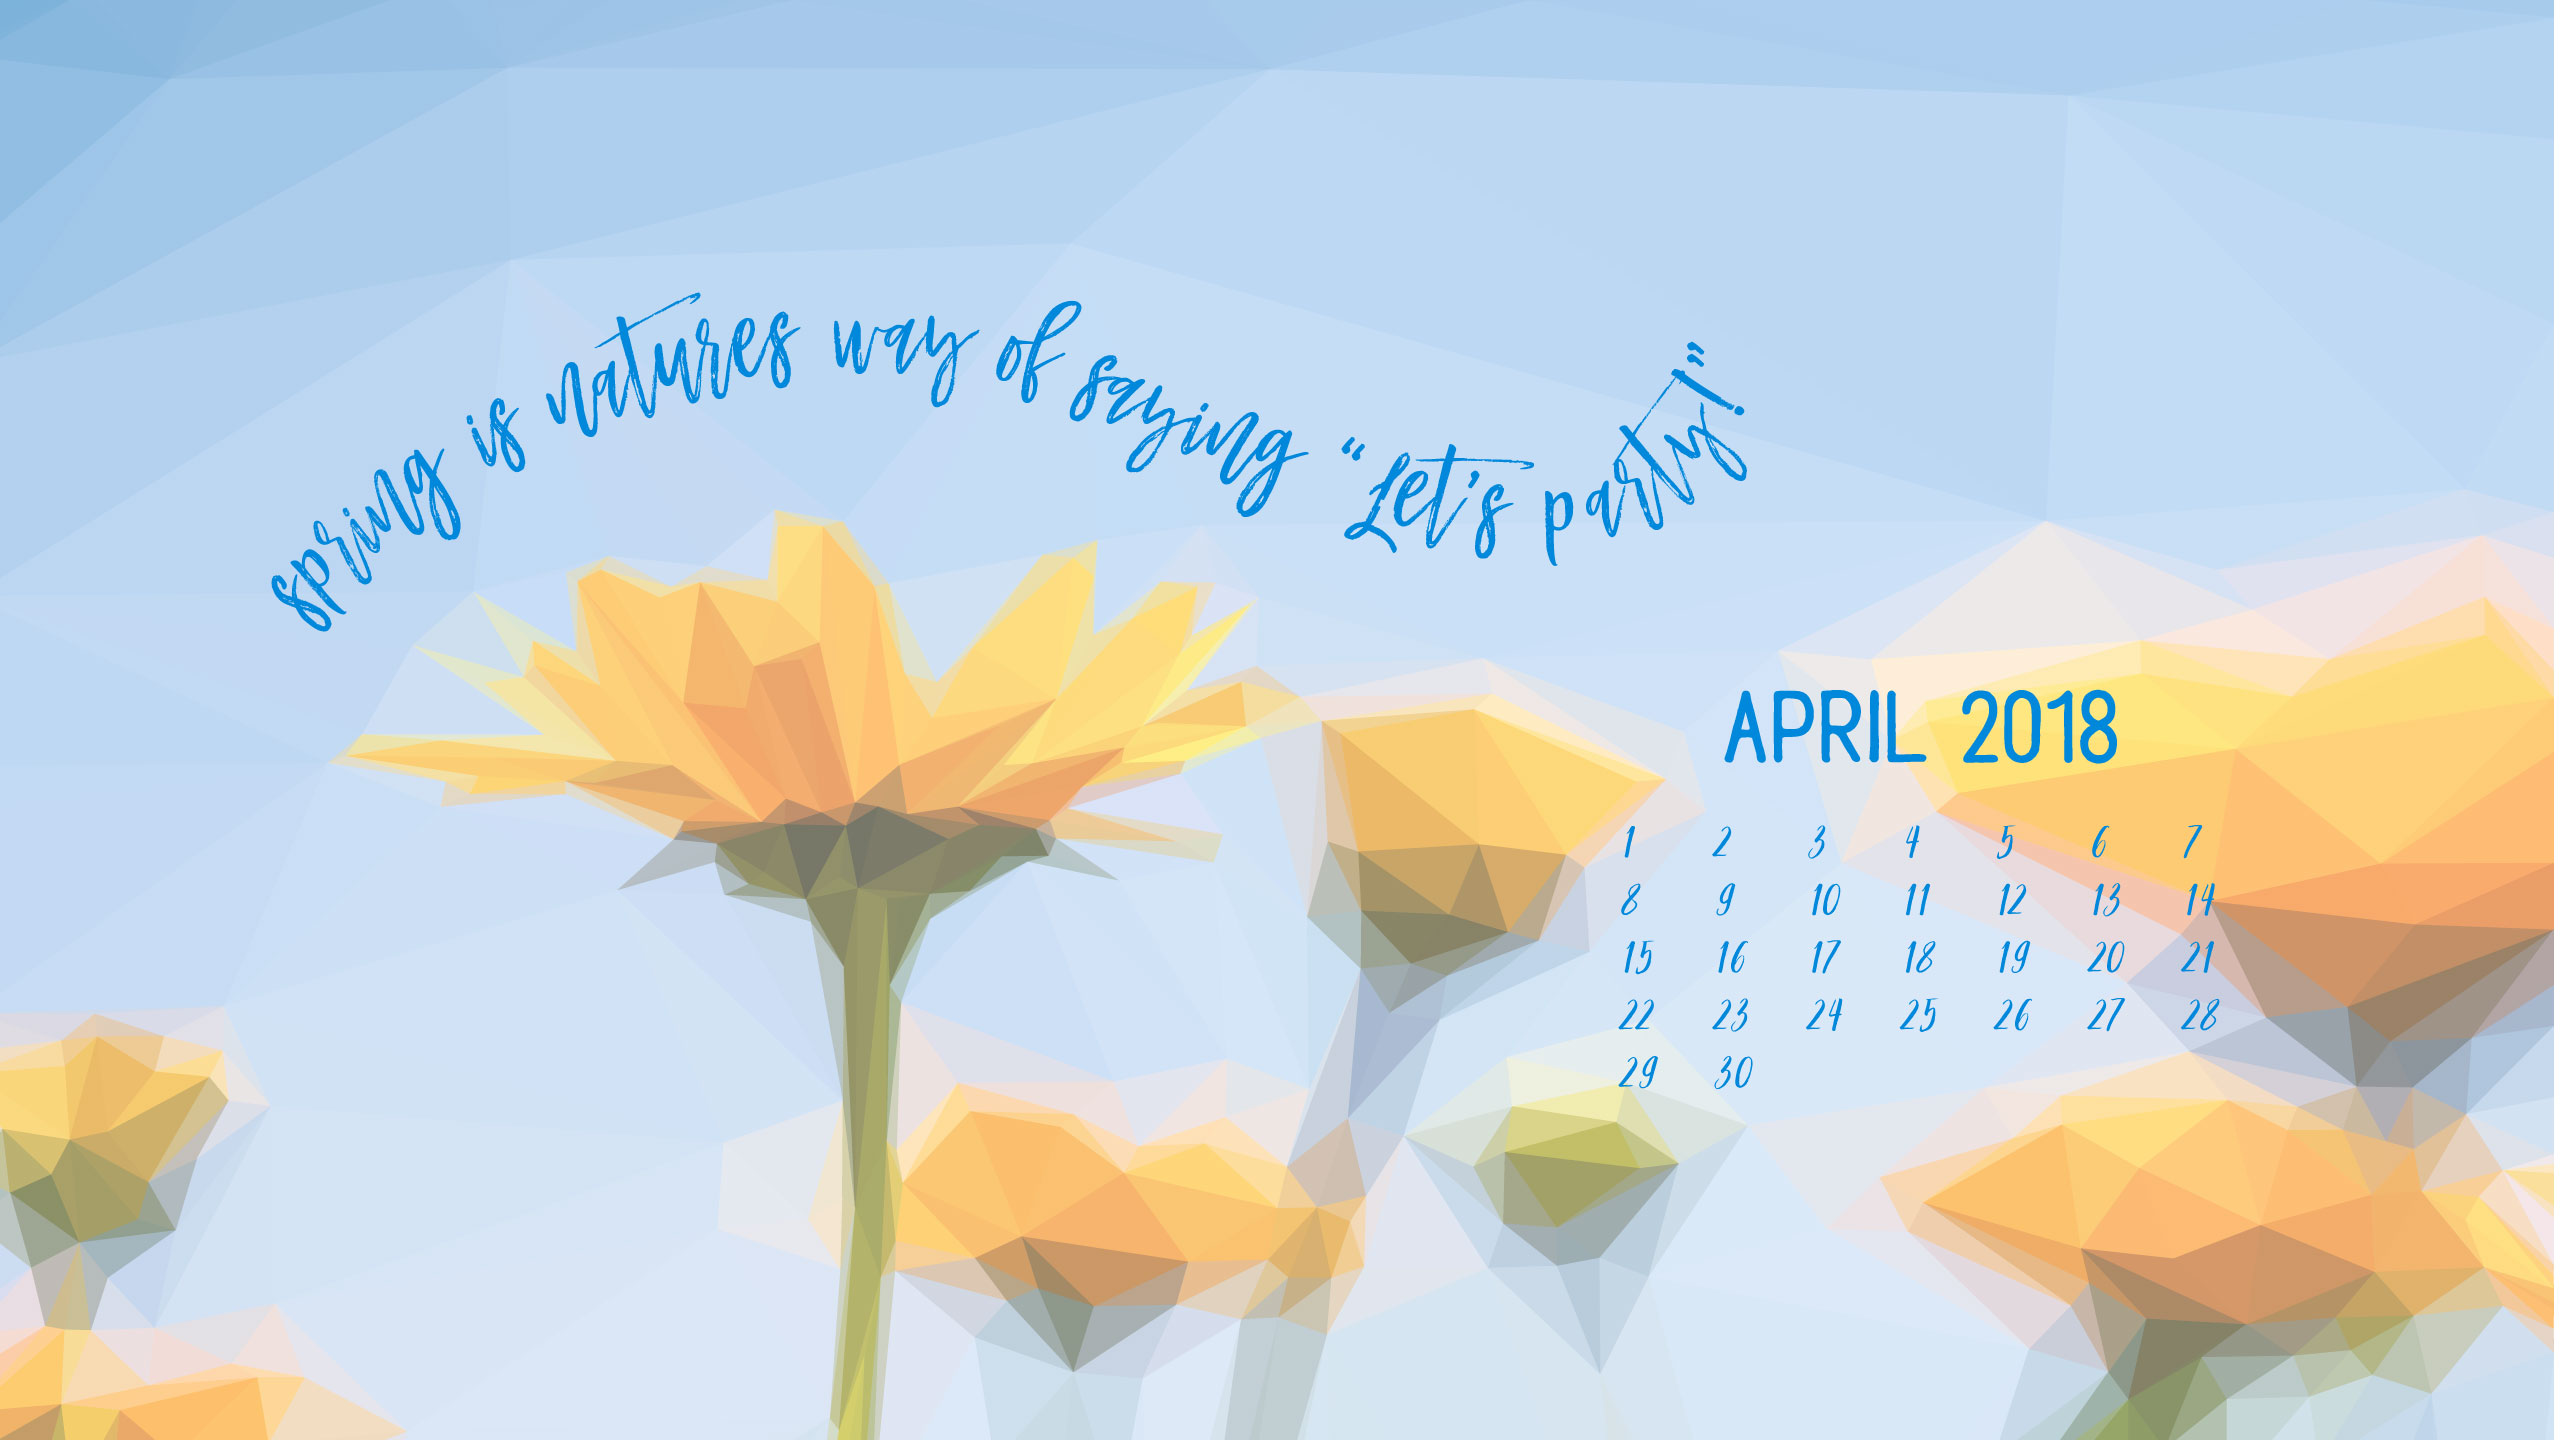 Geometric Daffodil Digital Wallpapers - Desktop with calendar